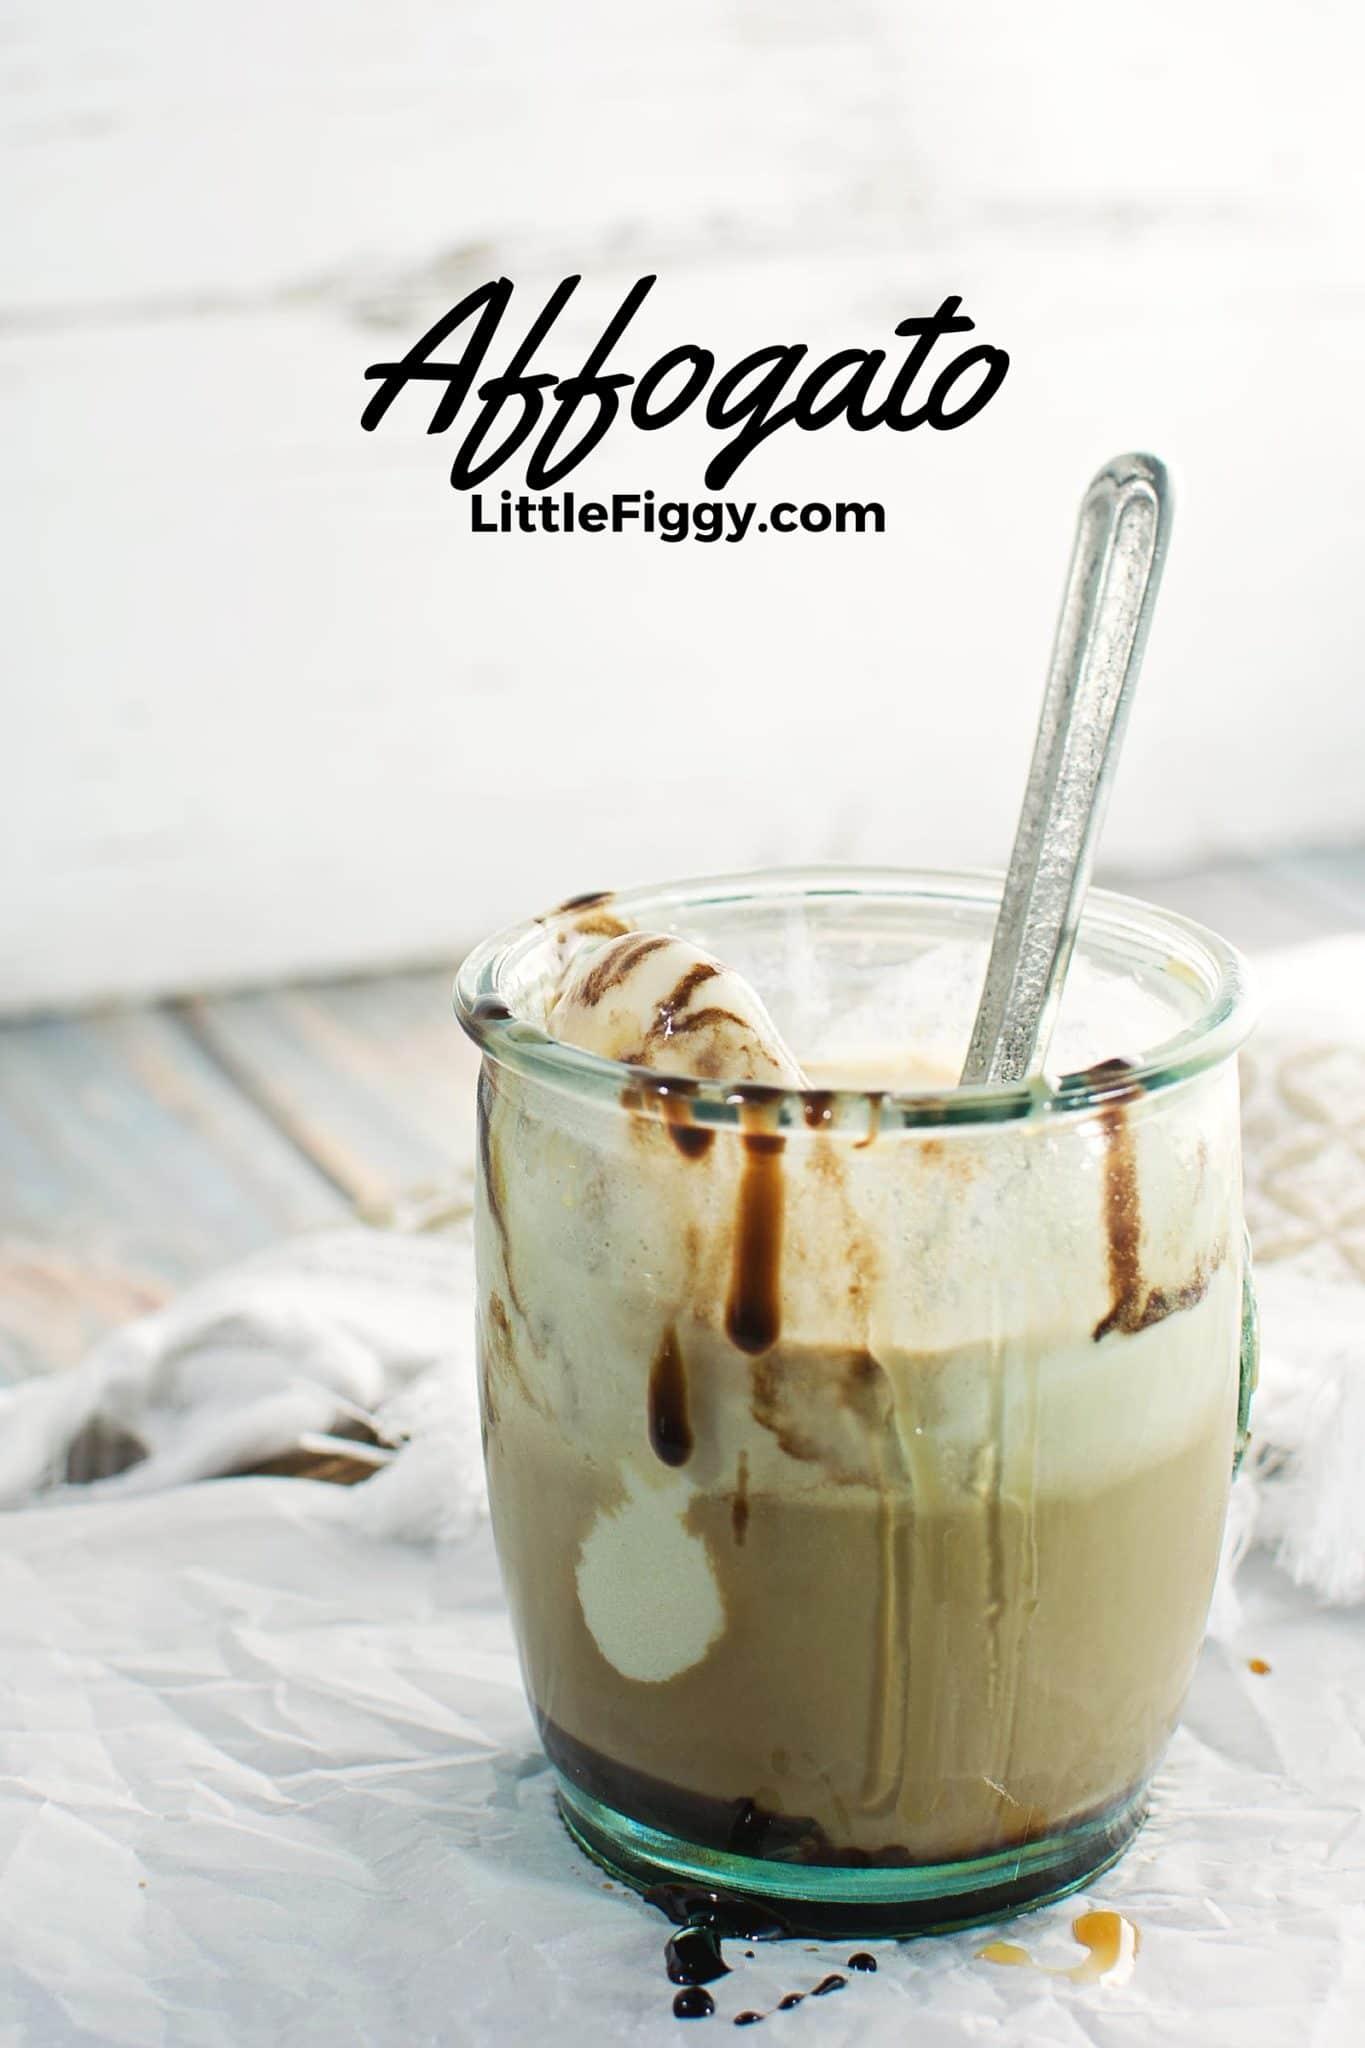 Try this super easy yet wonderful dessert, Affogato #recipe! Find the recipe @LittleFiggyFood